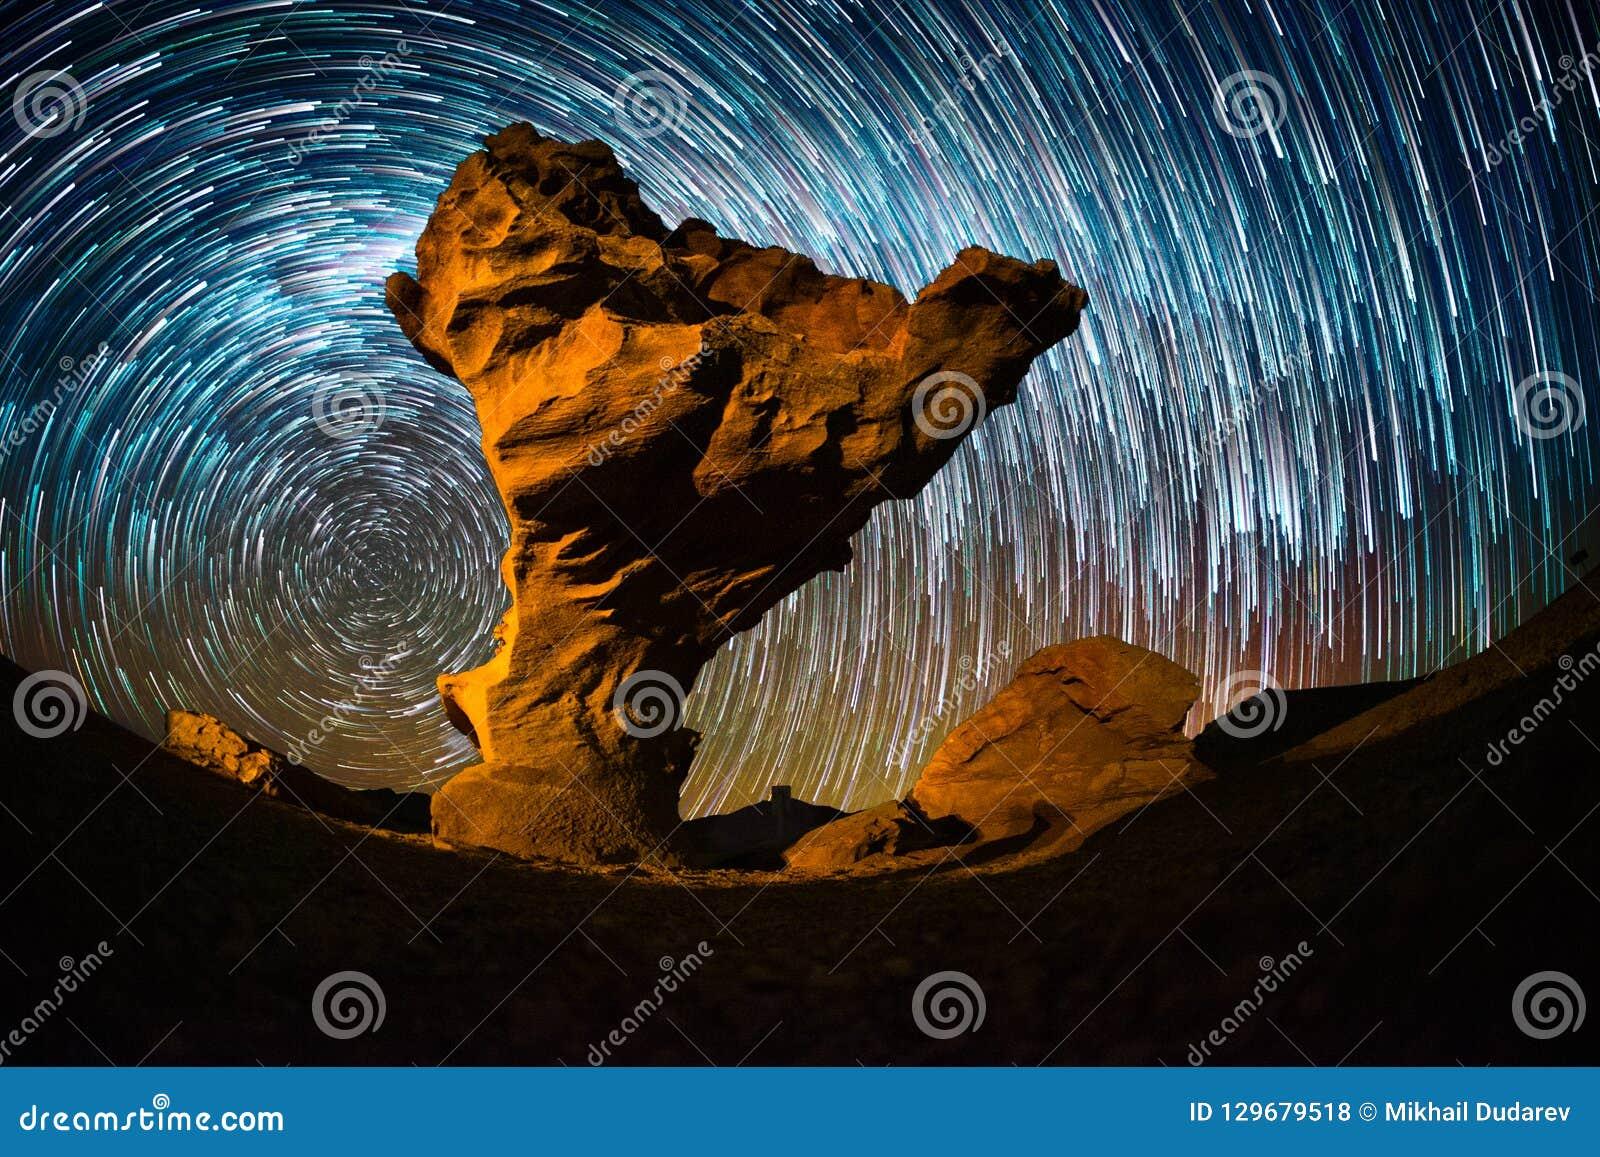 Sternenklarer Himmel mit den Sternspuren